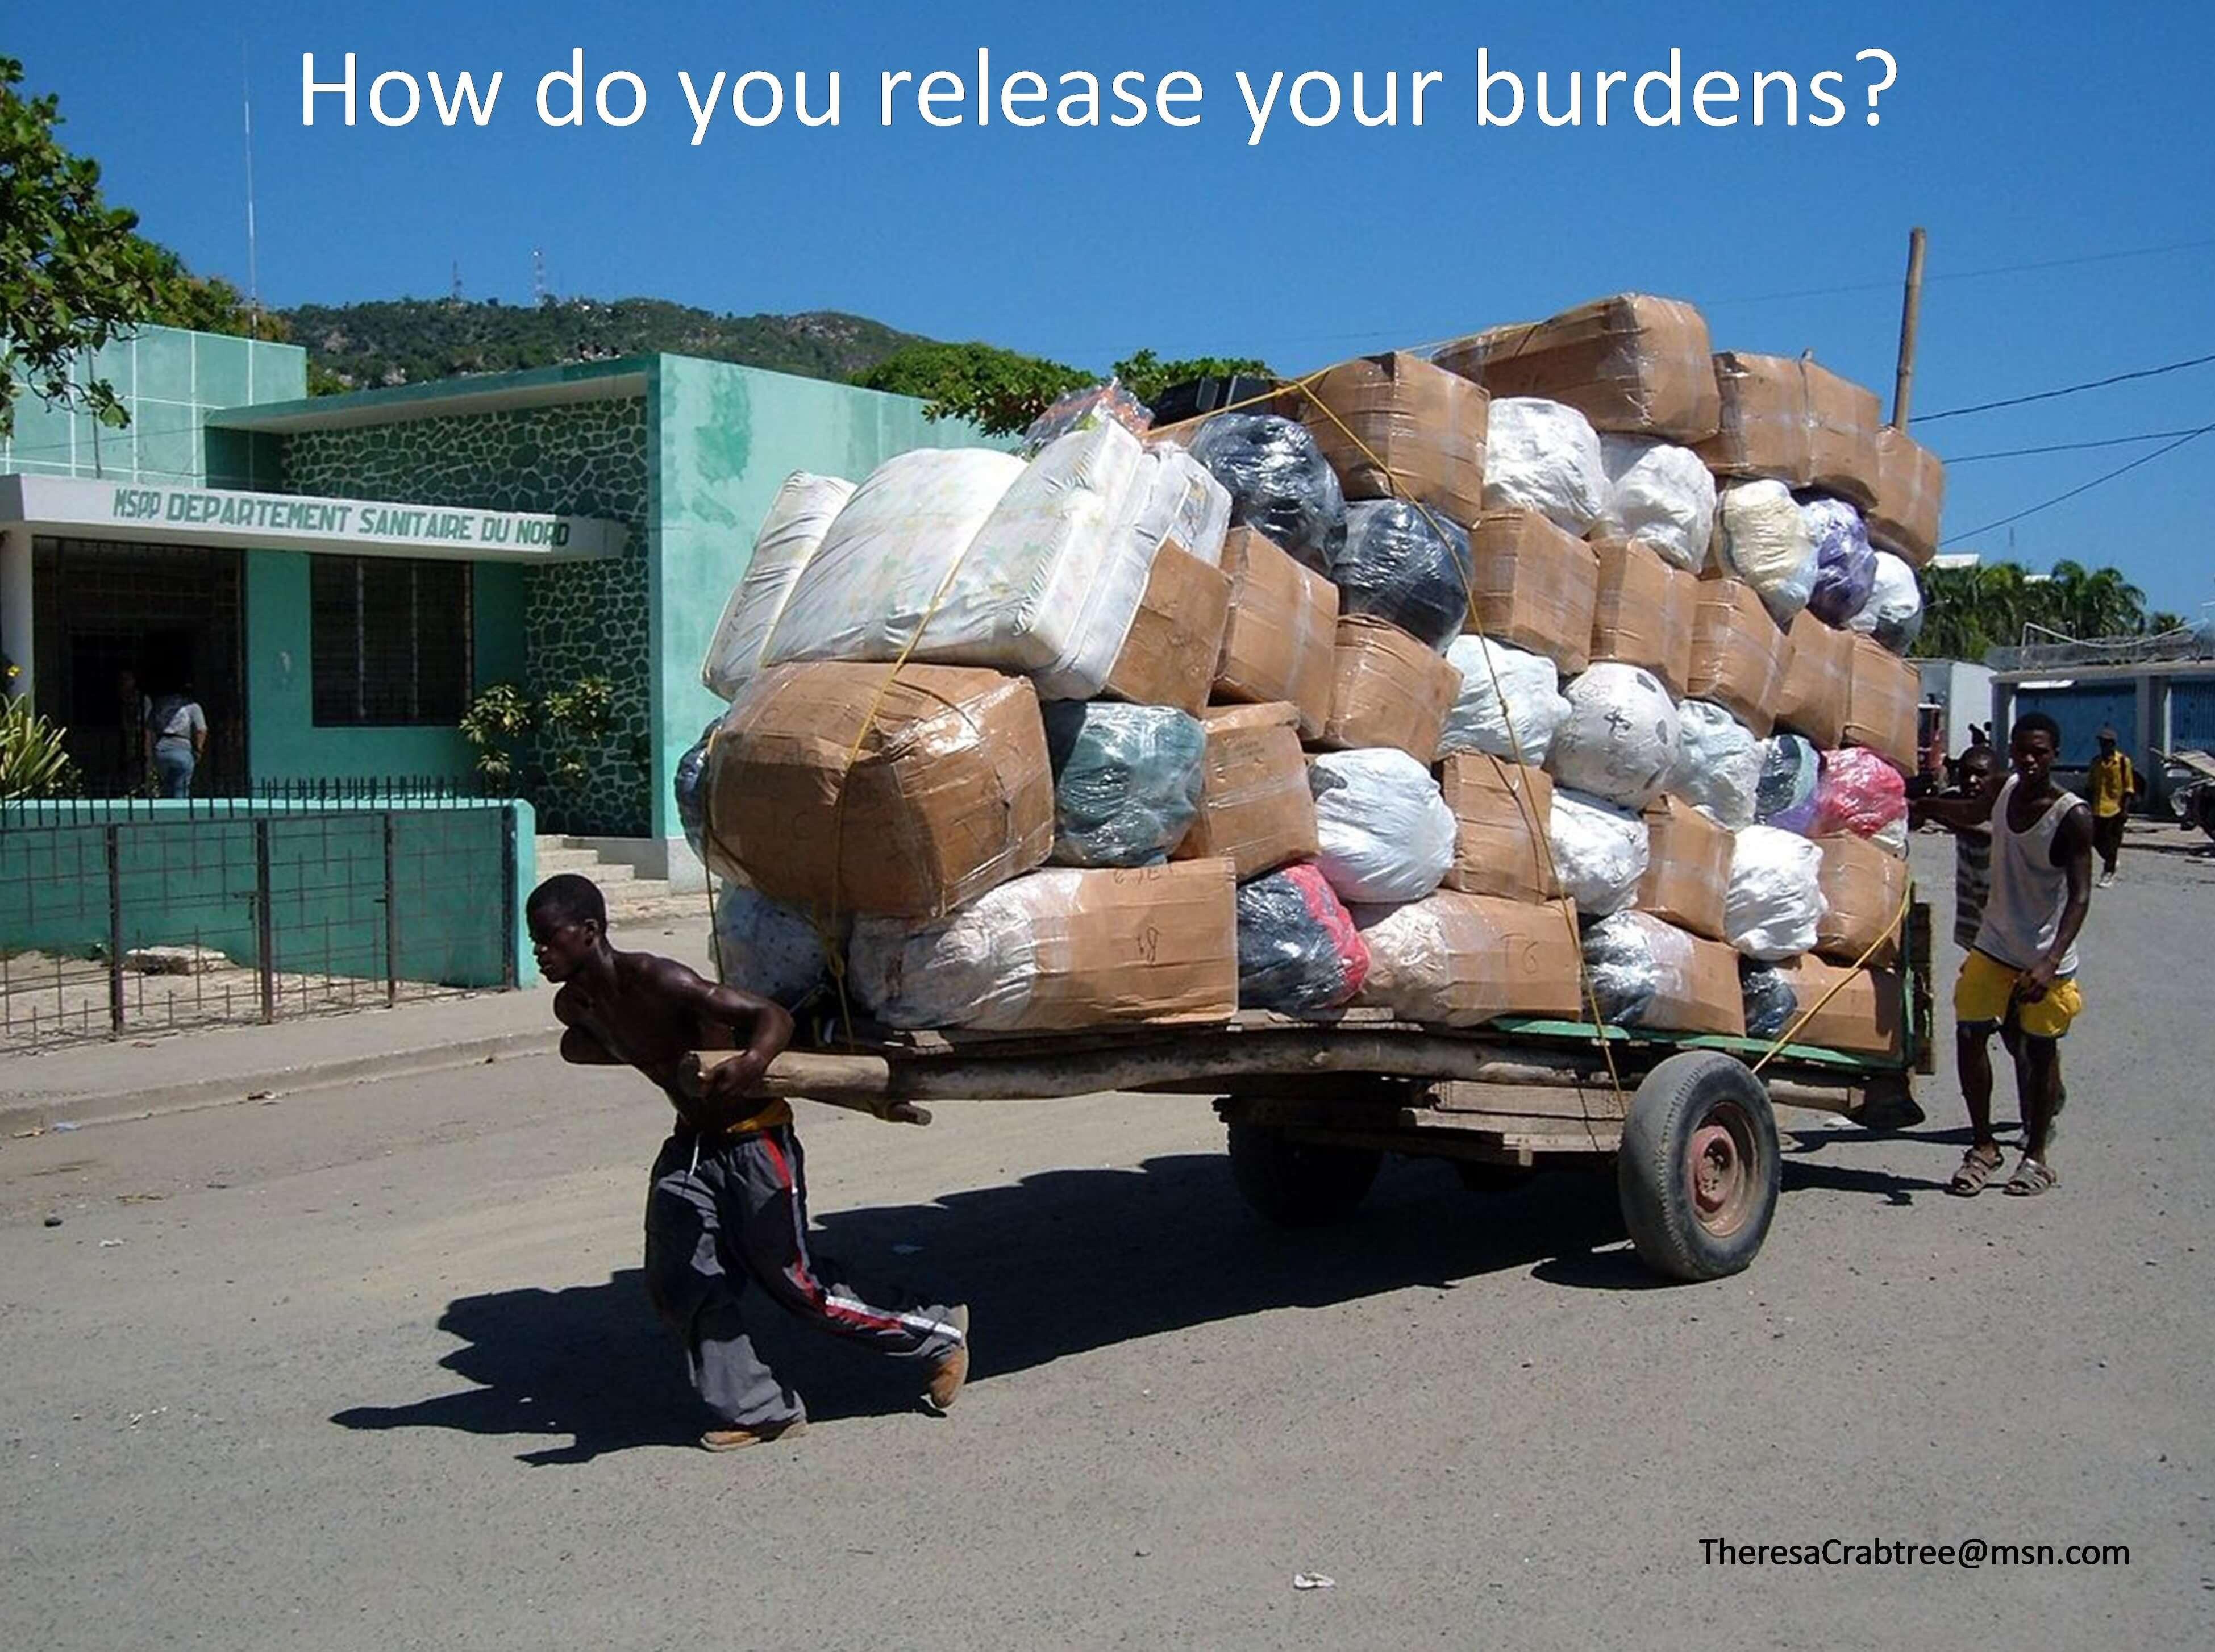 How do you release your burdens?